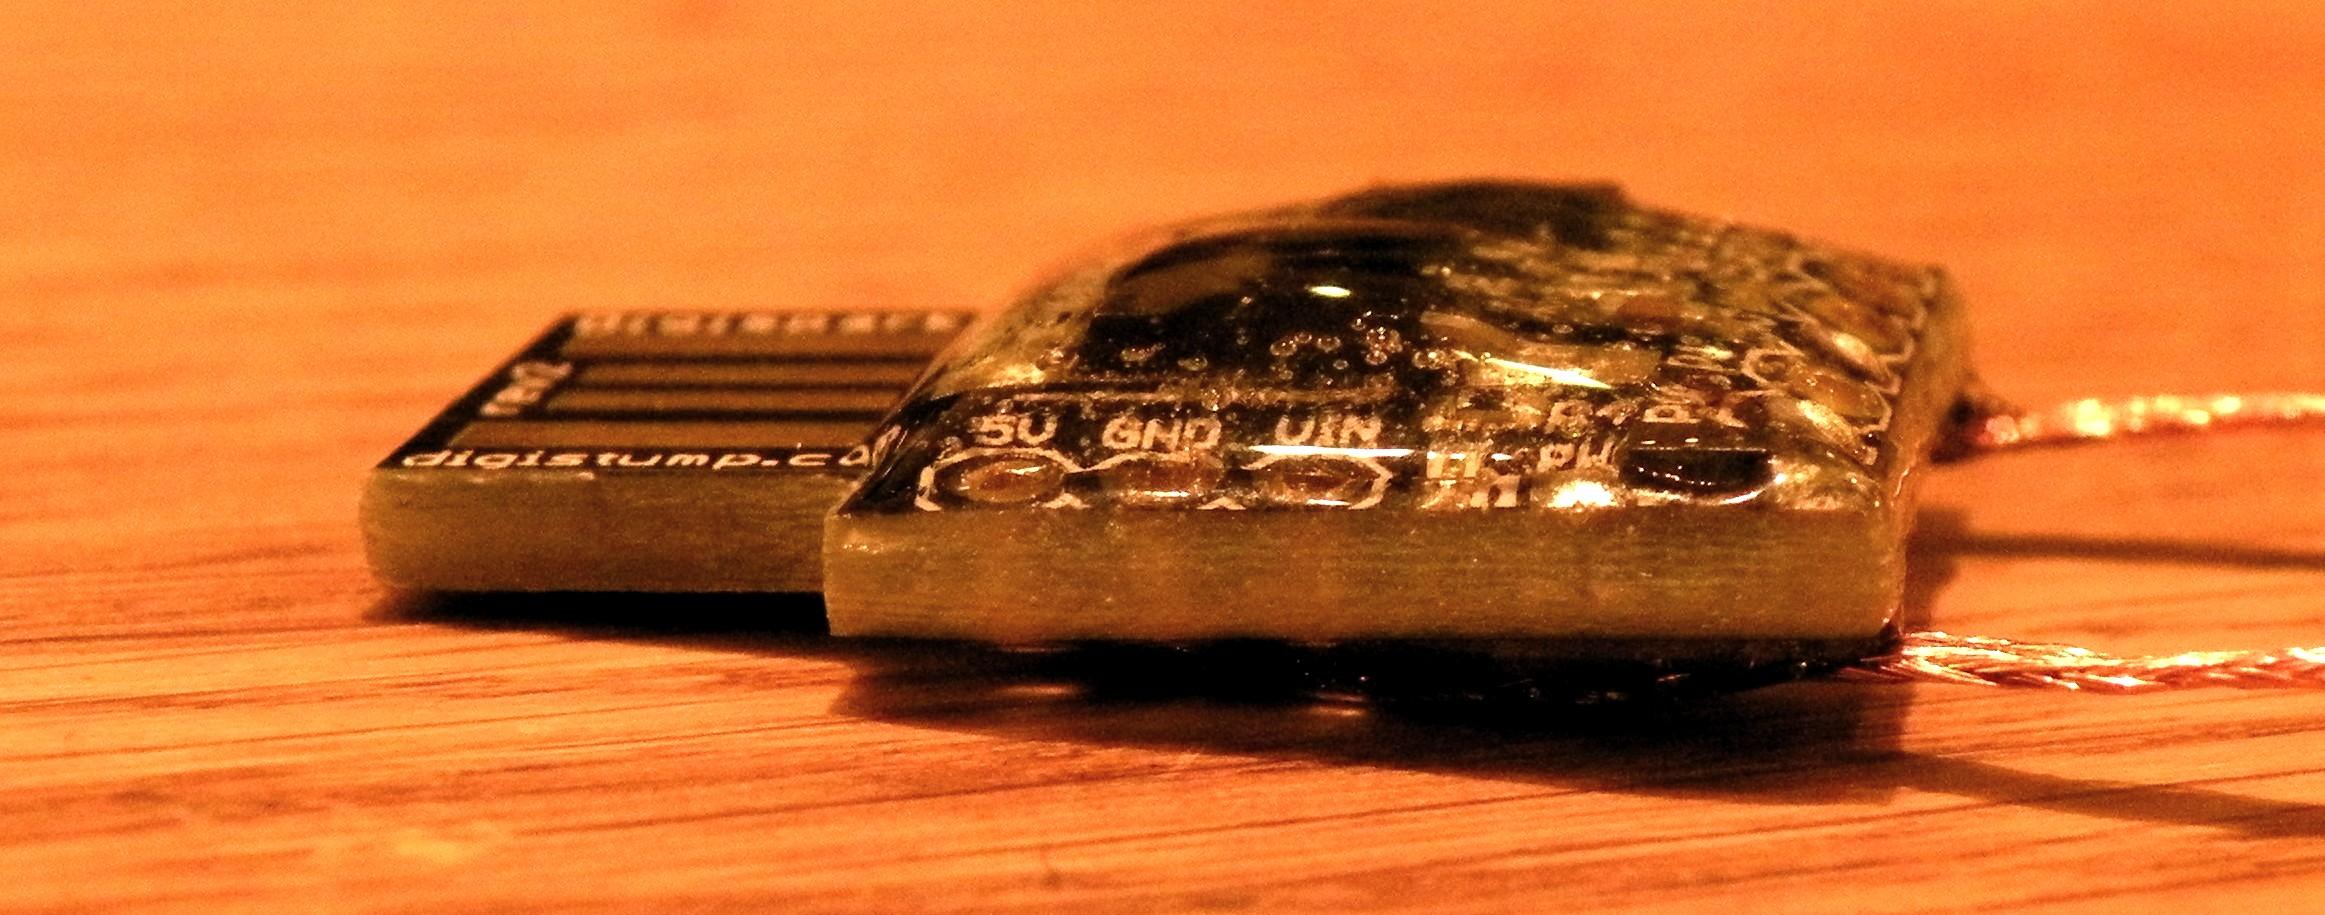 DSCN7418a.JPG